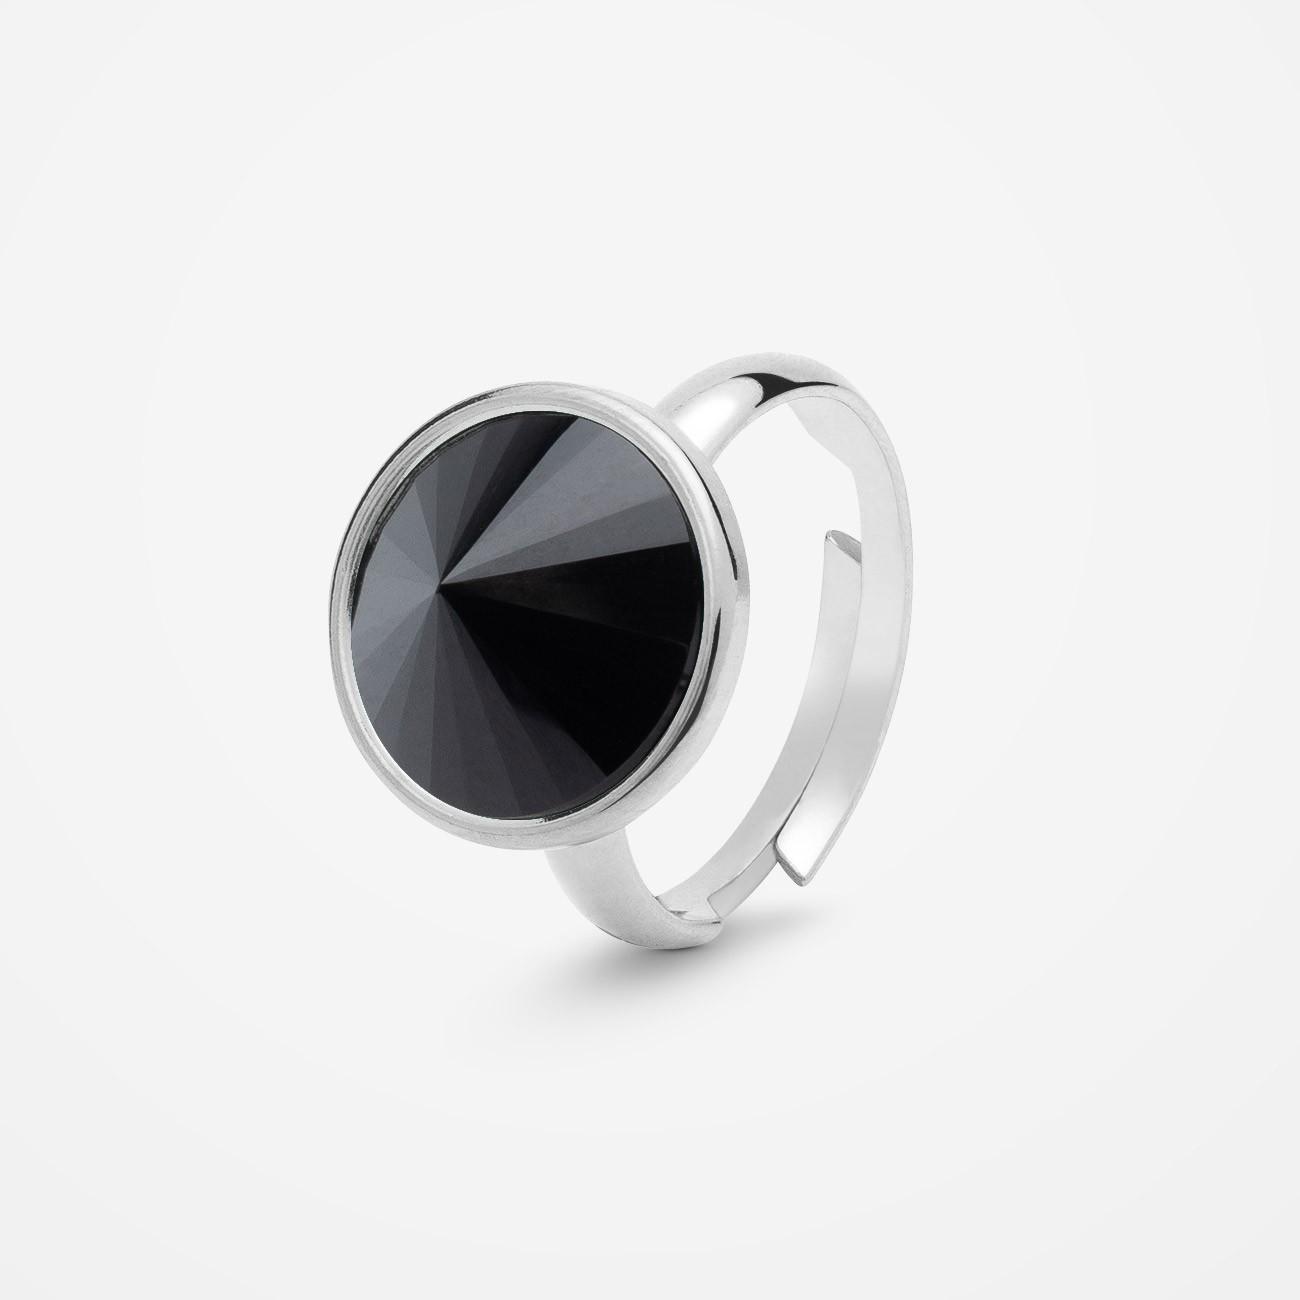 Srebrny pierścionek z naturalnym kamieniem, srebro 925